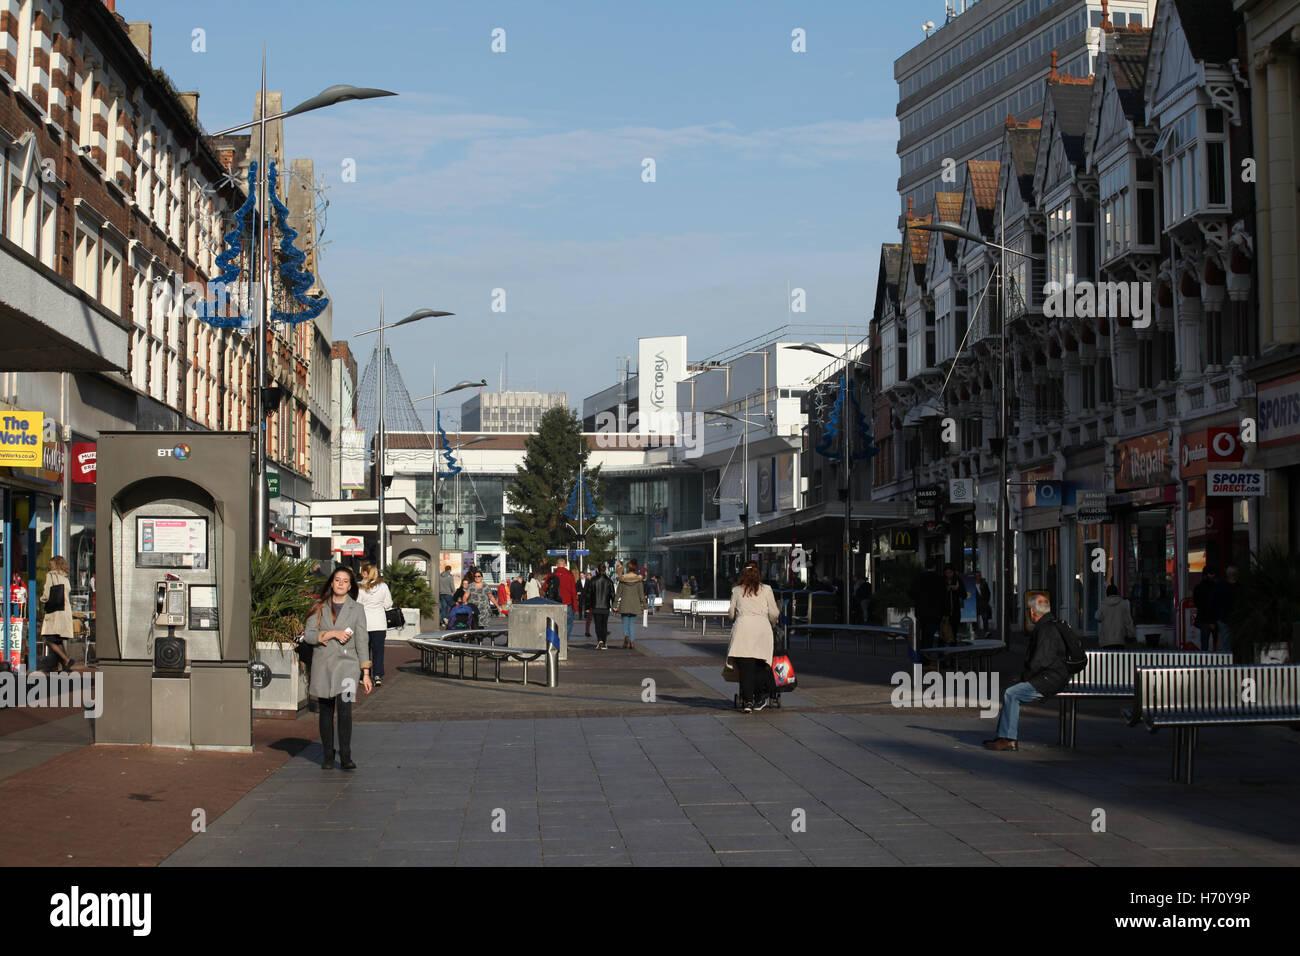 Shopping precinct, High Street, Southend-on-Sea, Essex - Stock Image